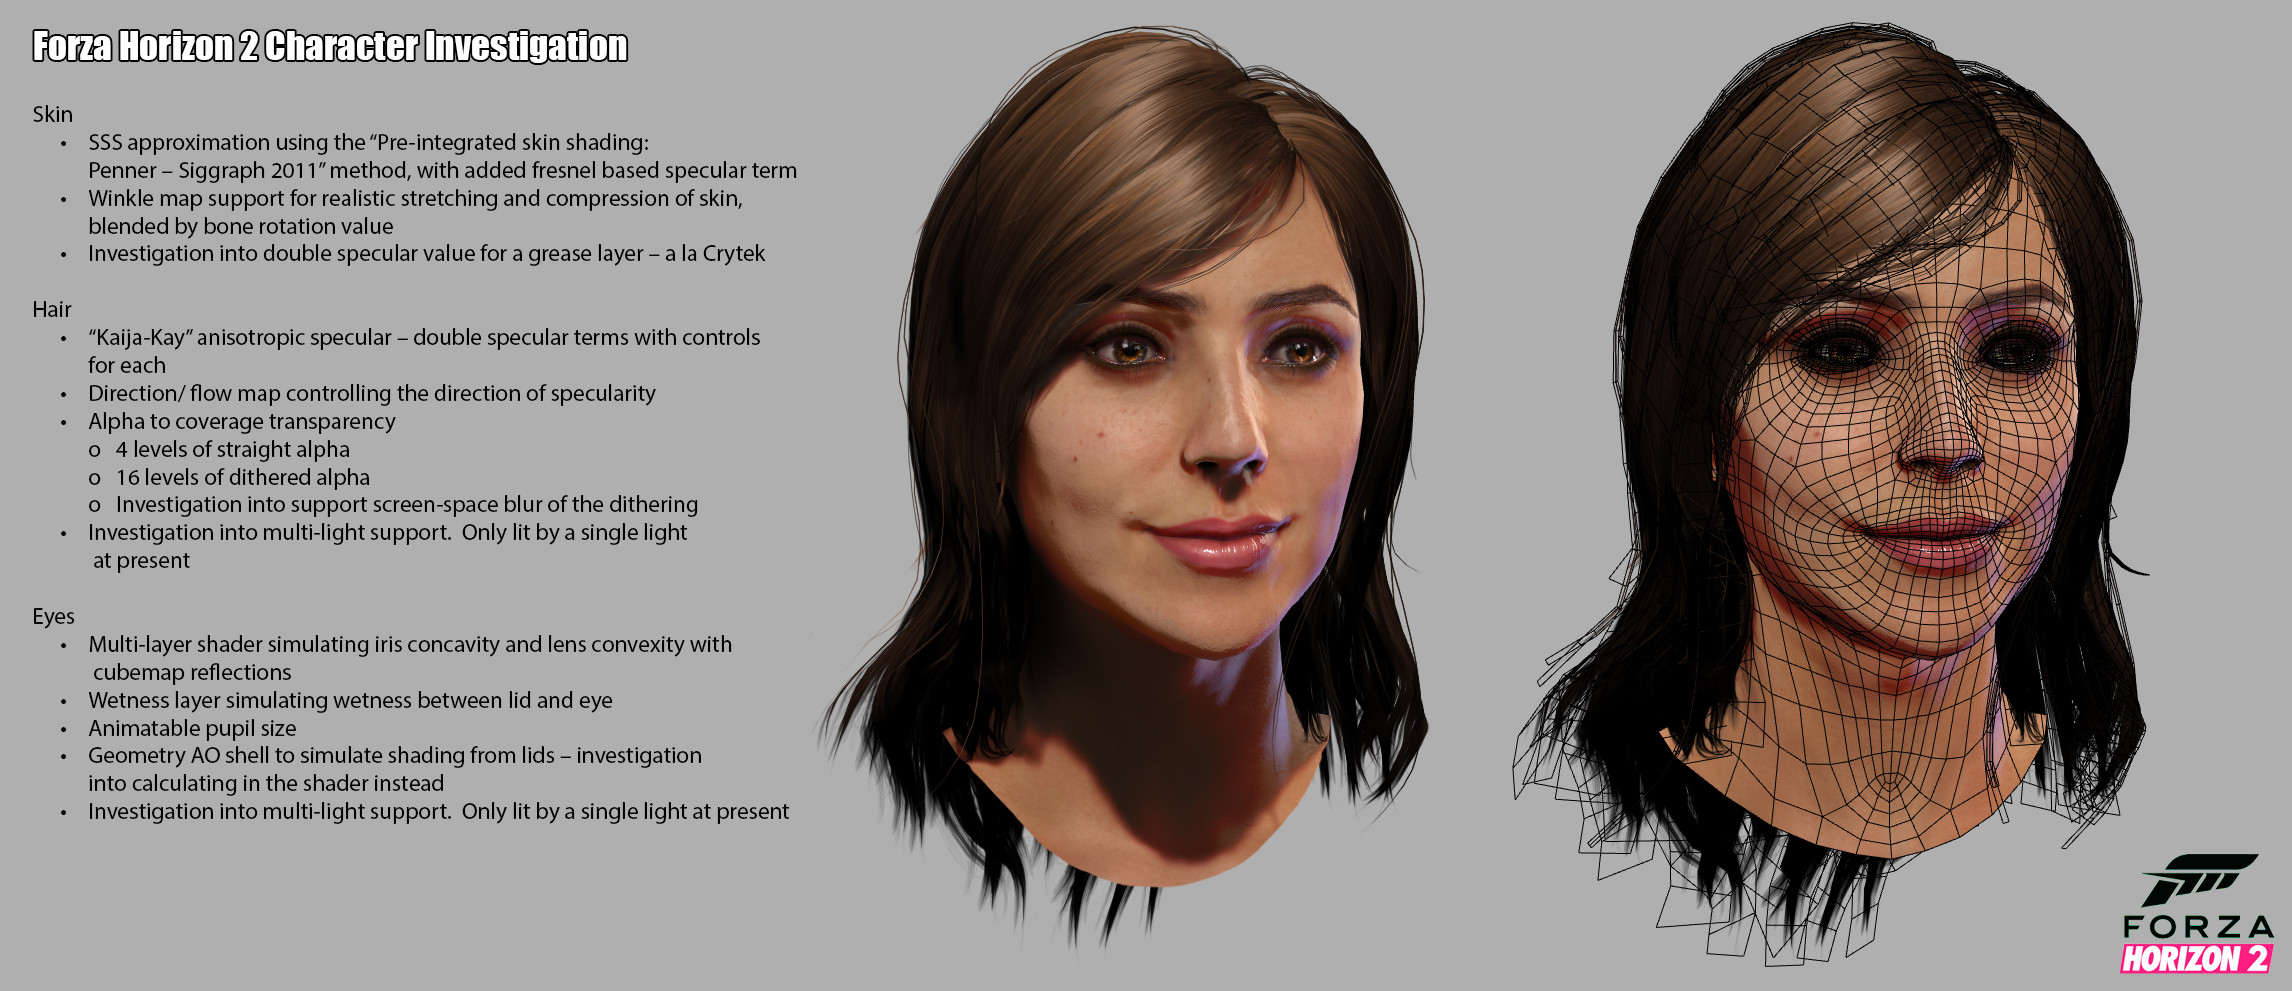 Forza Horizon 2 - Character Investigations